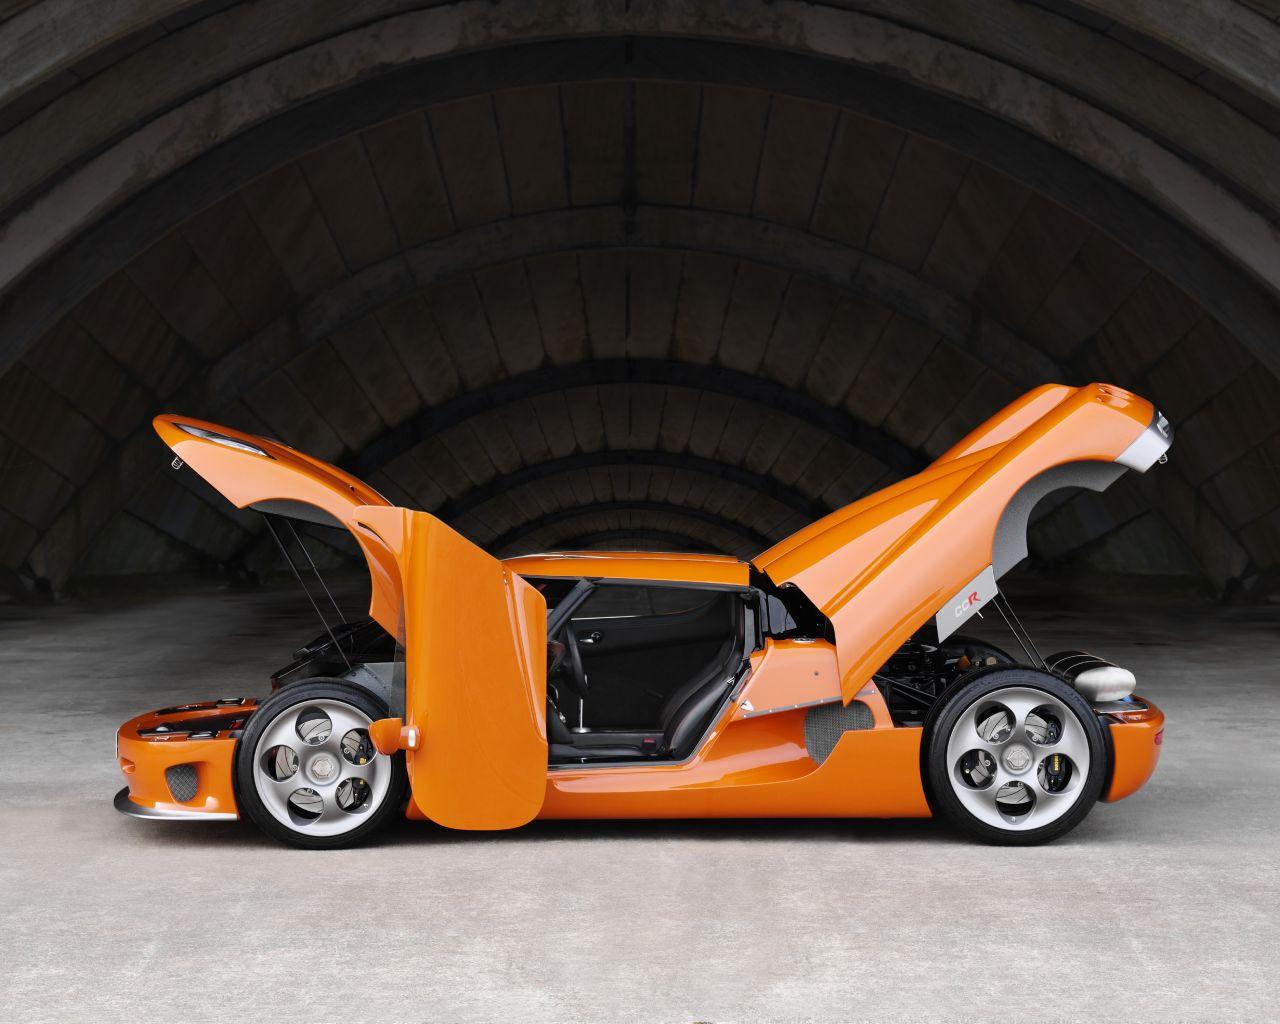 Wallpaper: Koenigsegg CCR